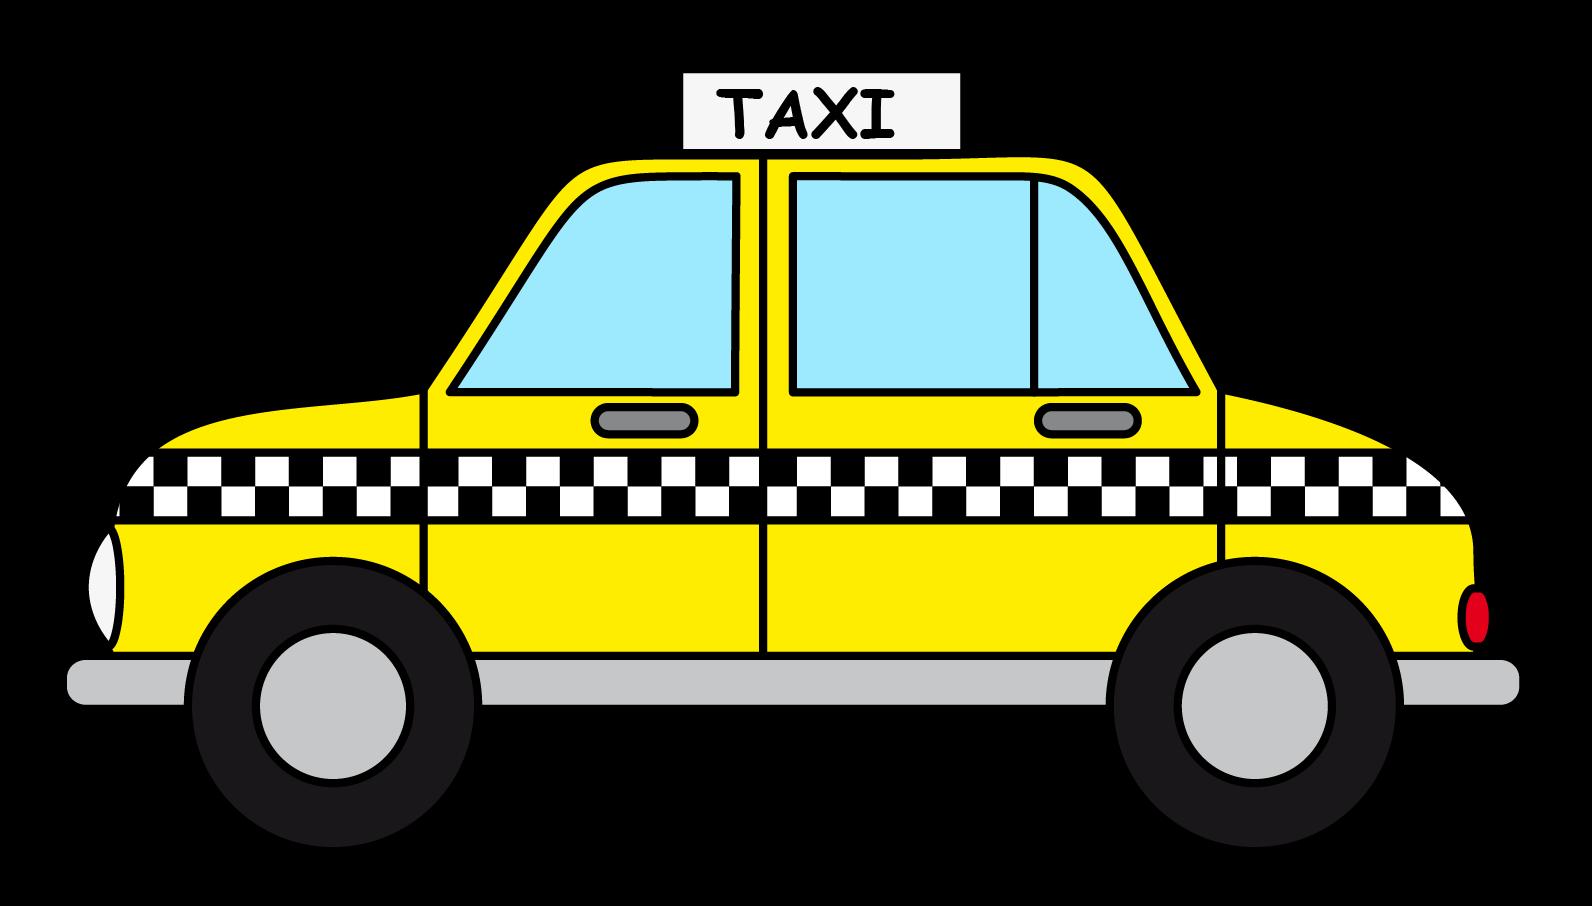 Transportation clipart printable. Beautiful taxi cab clip